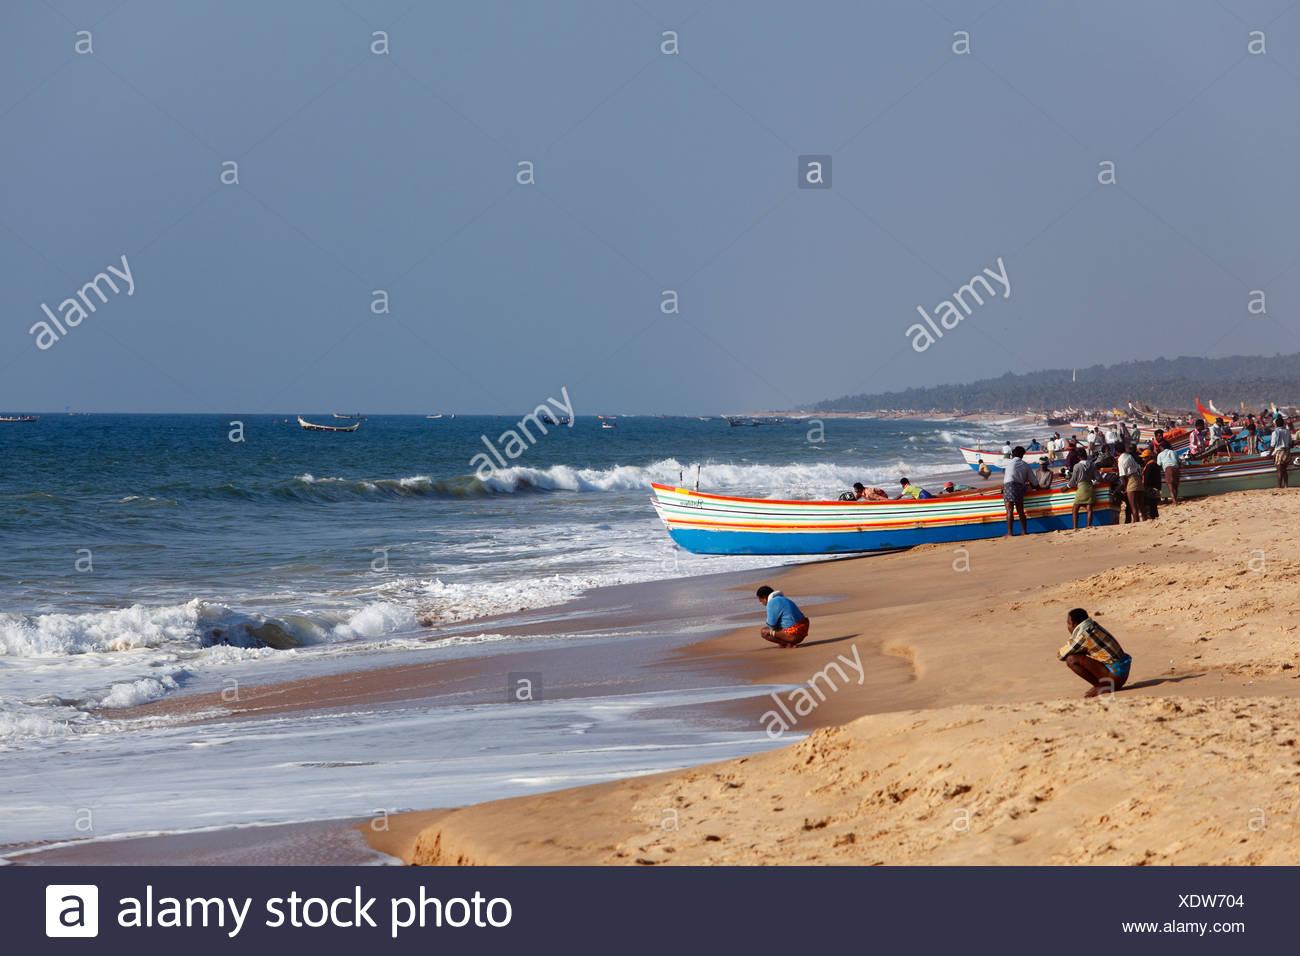 Fishermen prepare for taking their fishing boats out to sea, Somatheeram Beach, Malabarian Coast, Malabar, Kerala state, India, - Stock Image